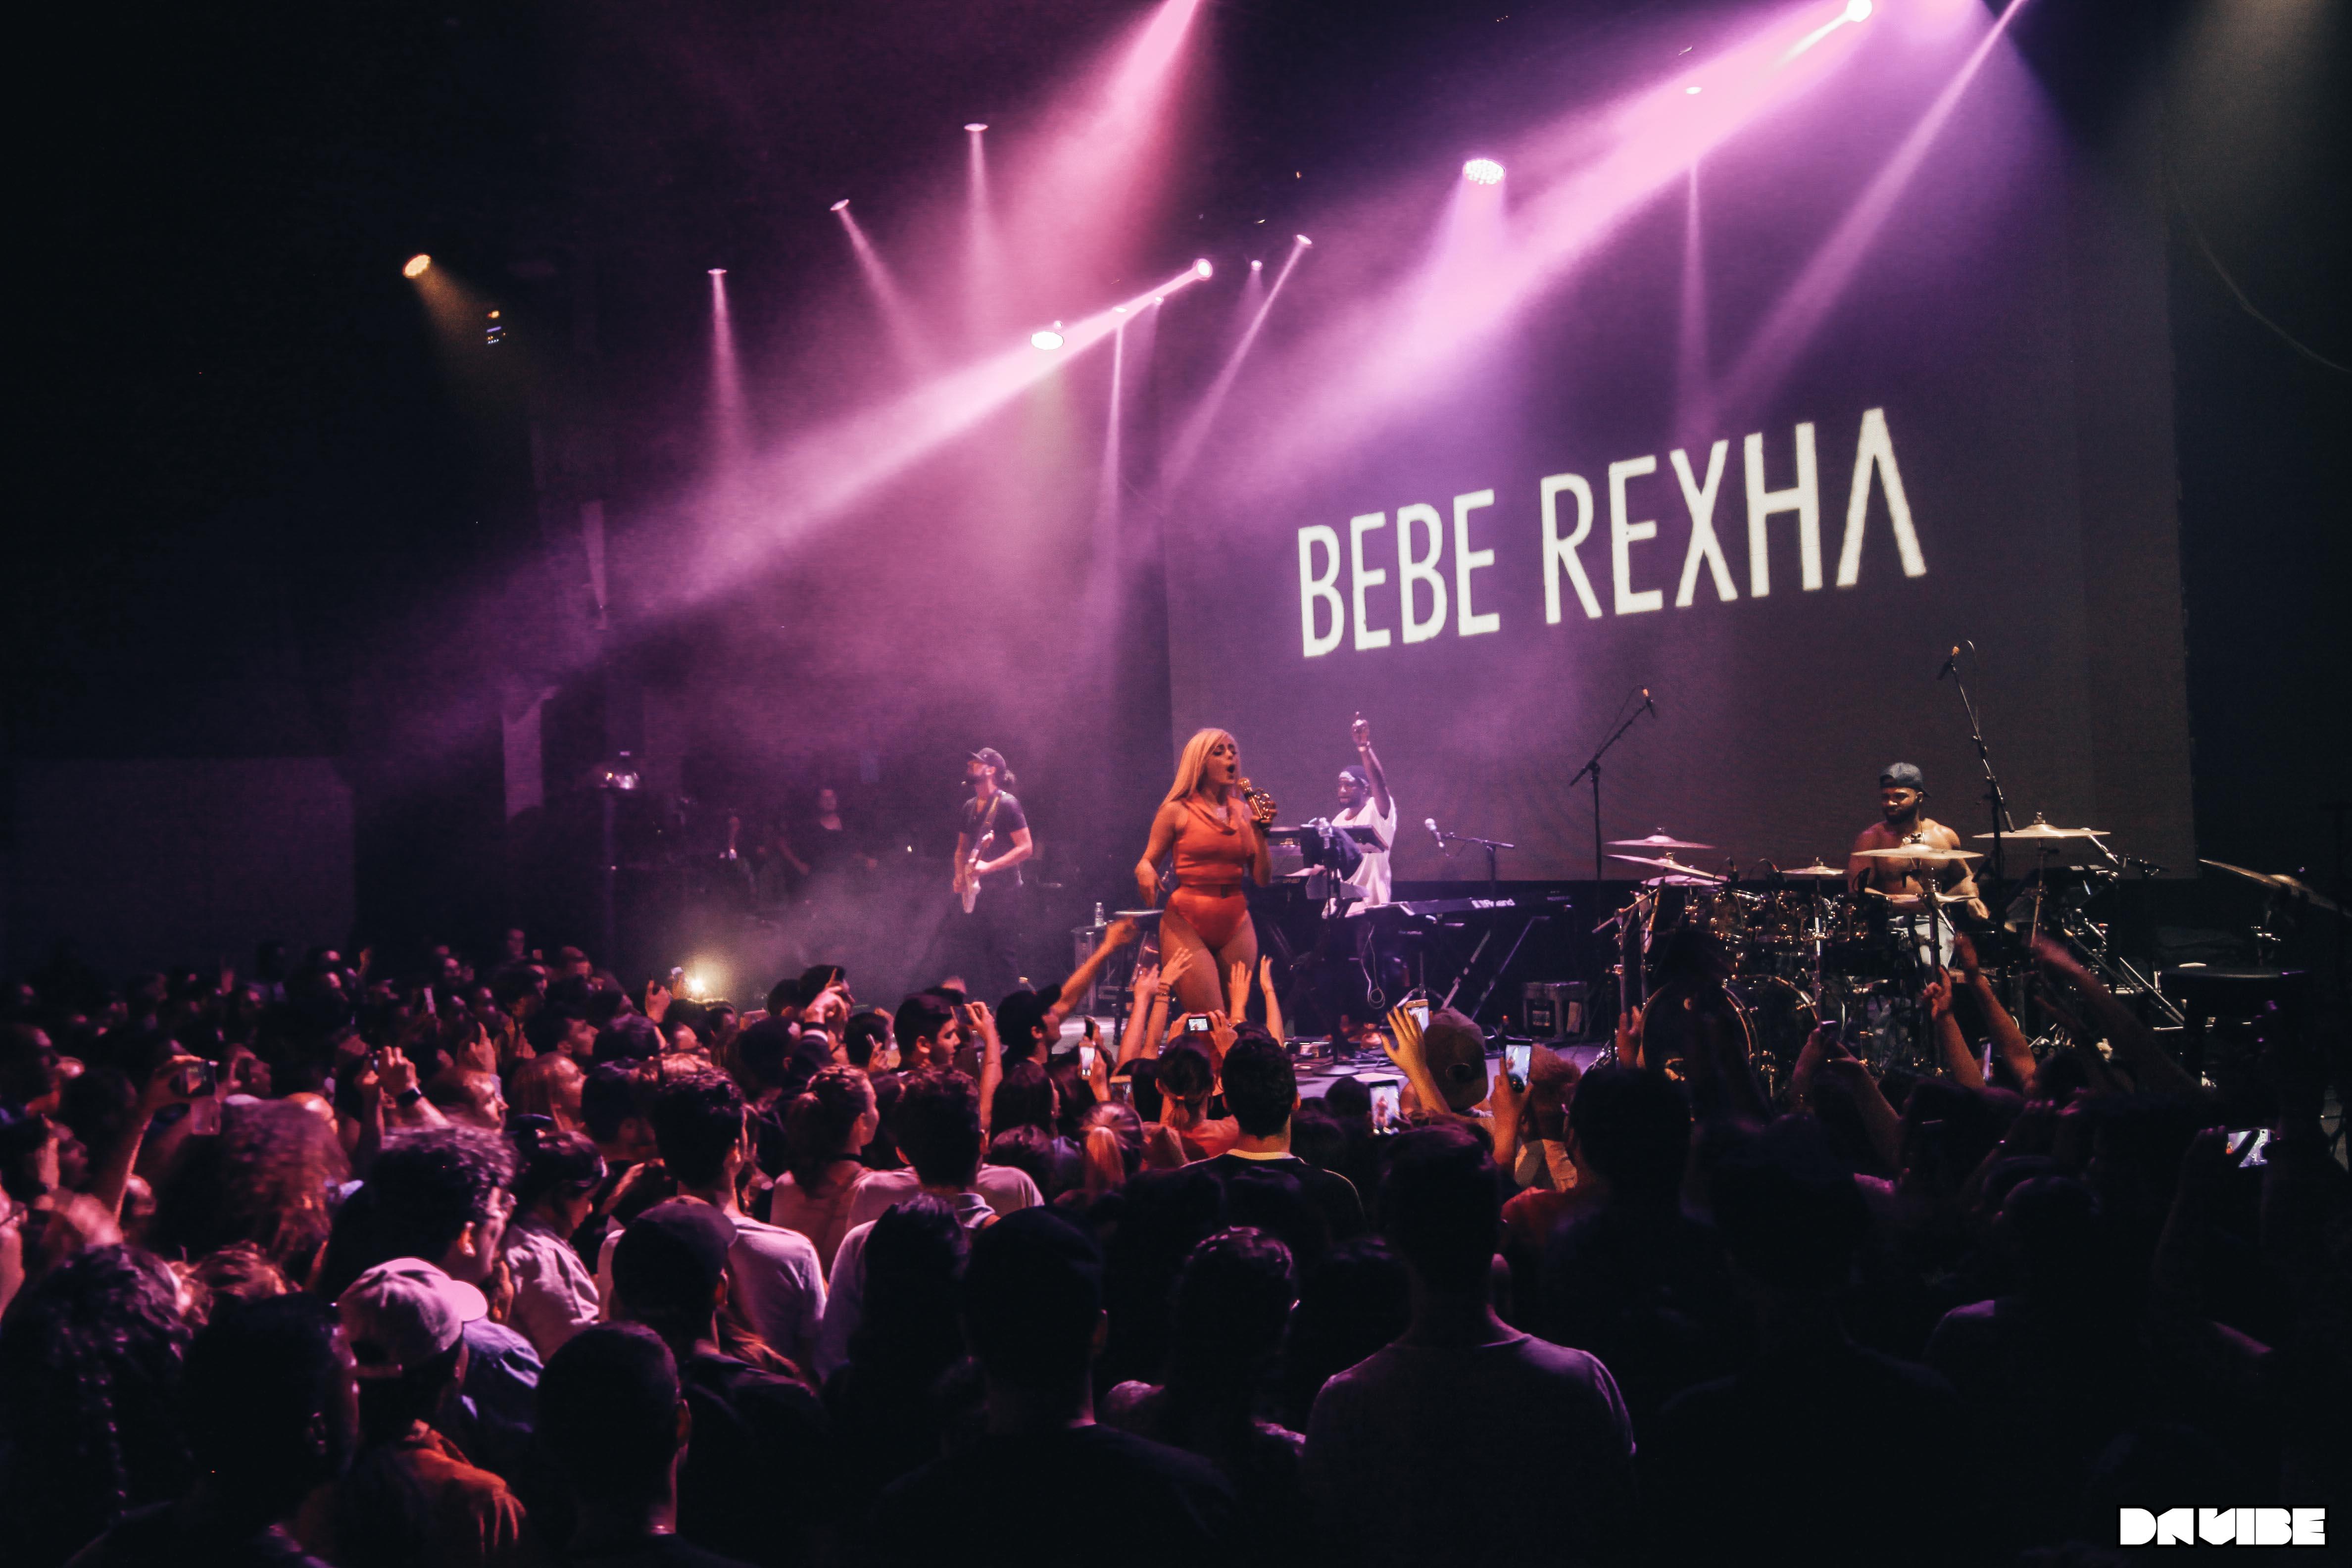 beberexha-63